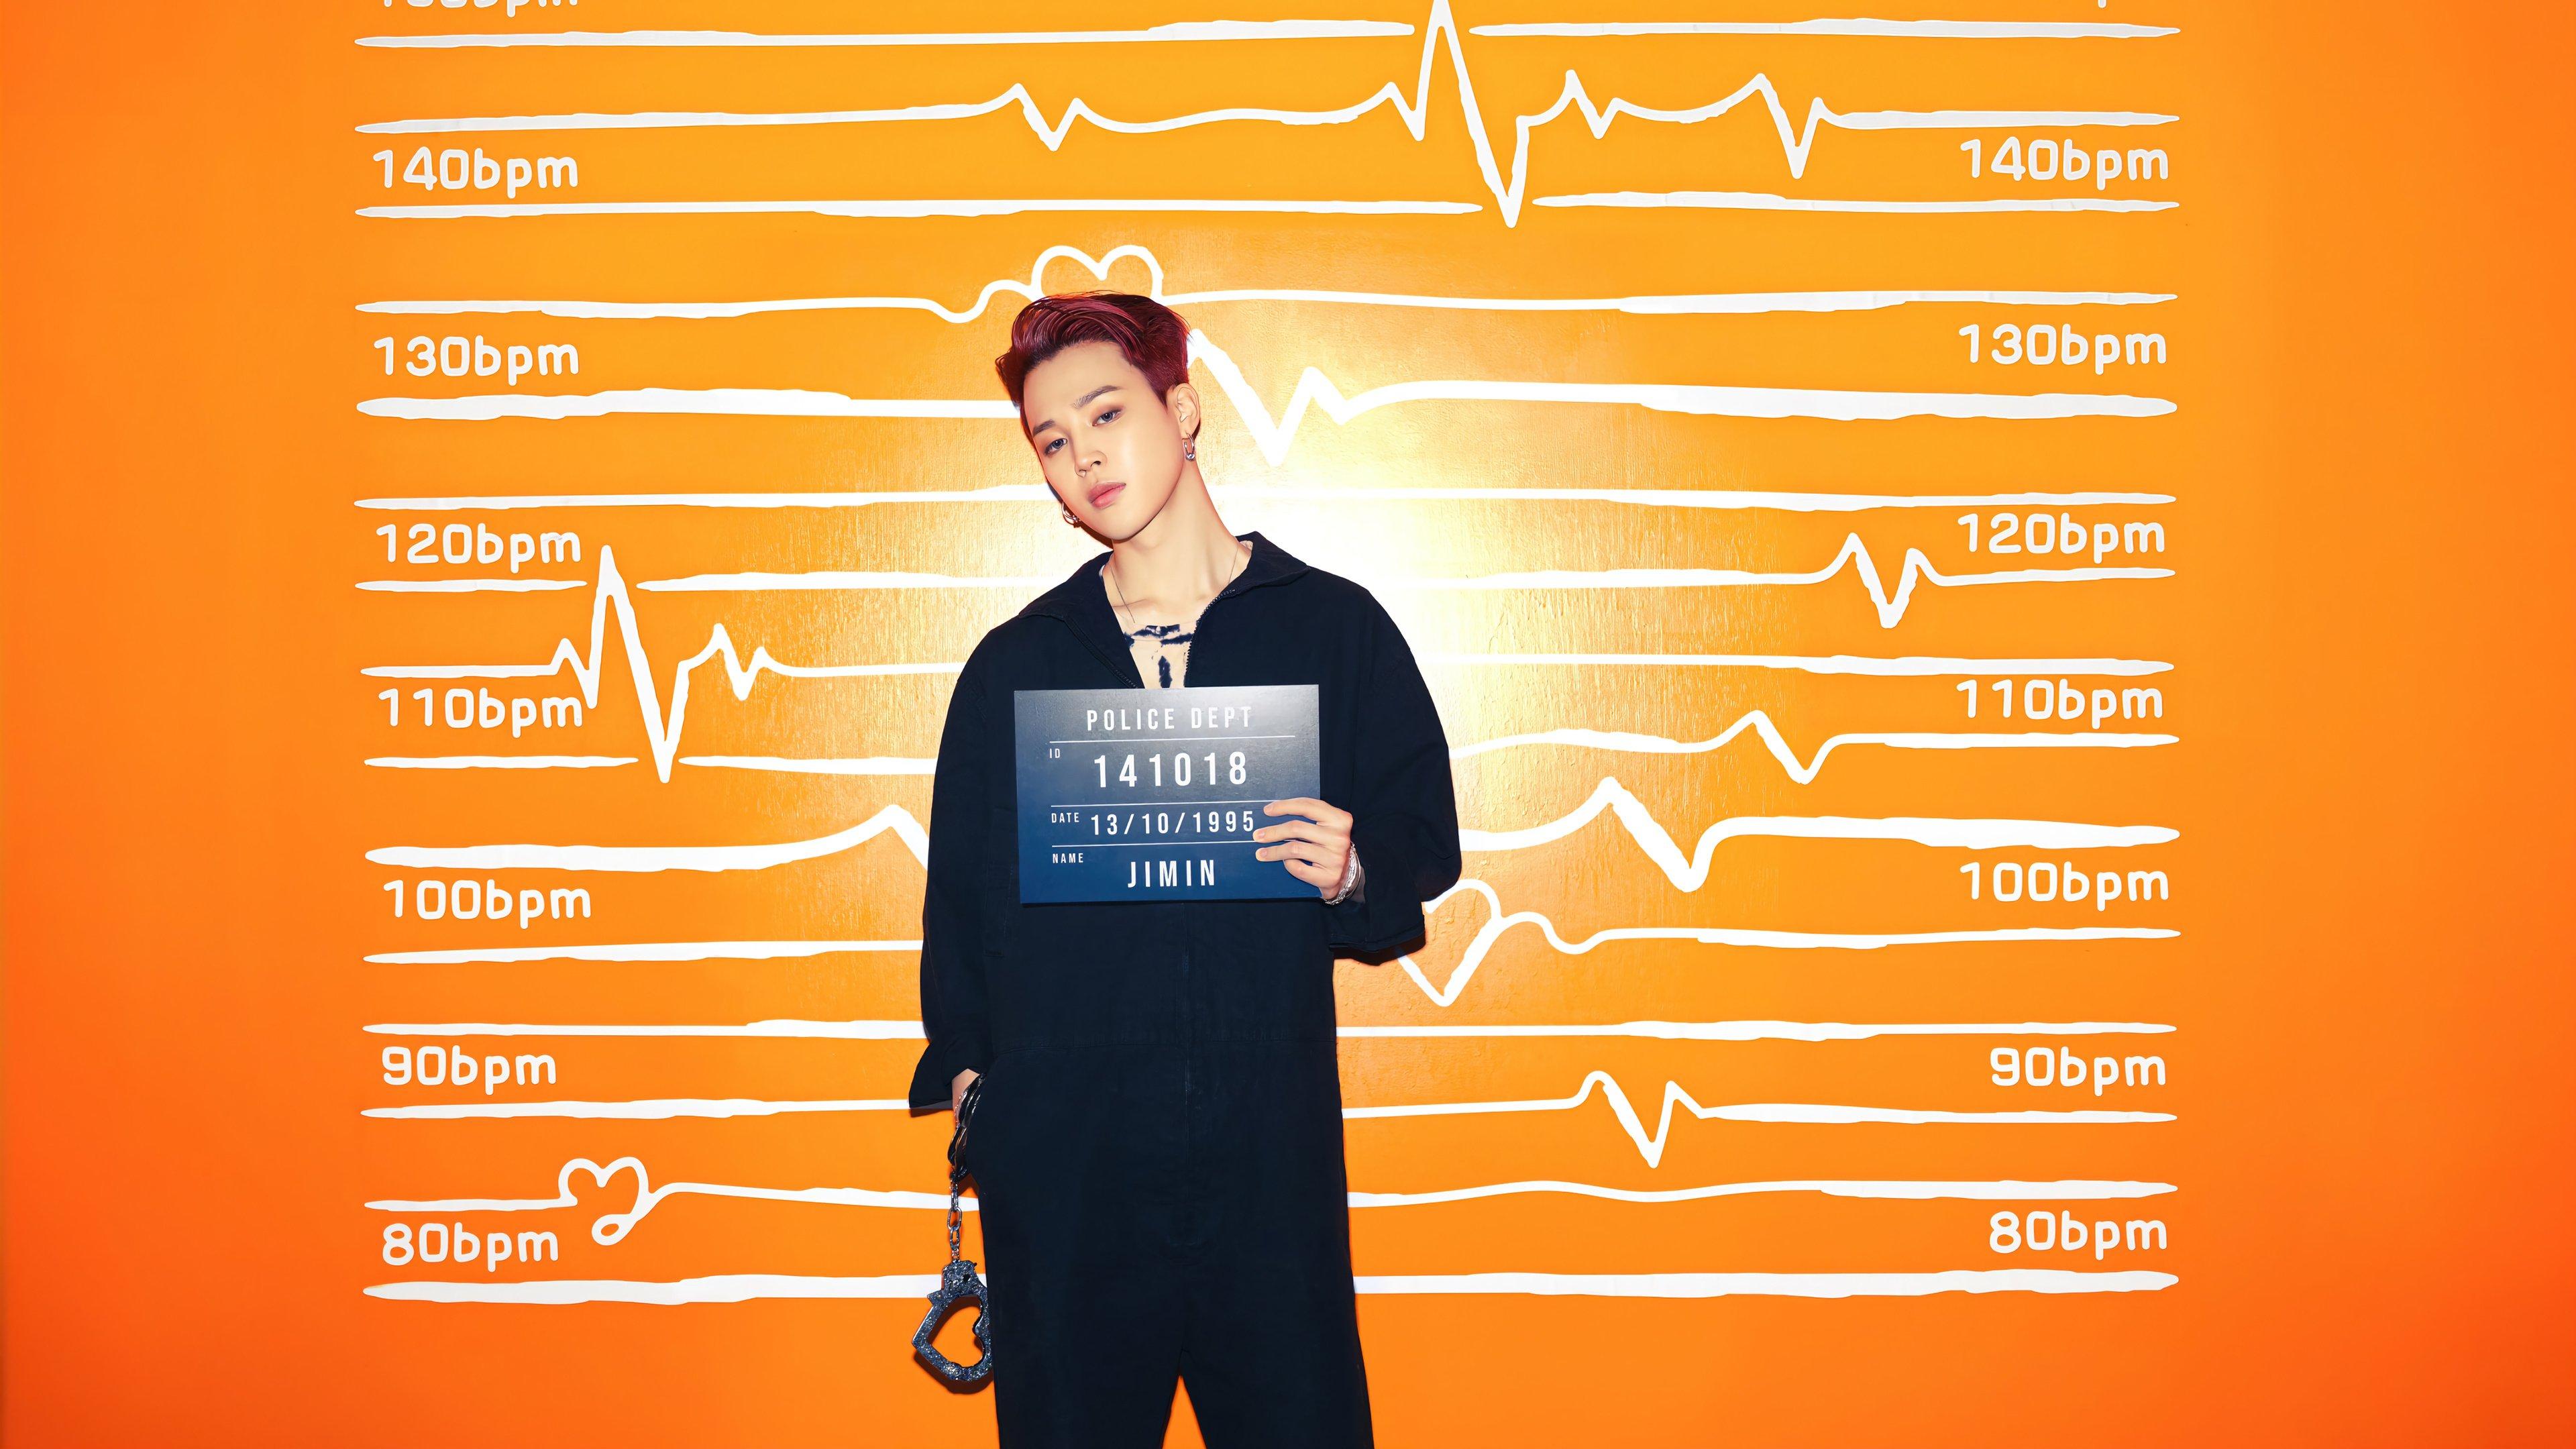 Wallpaper Jimin from BTS Butter